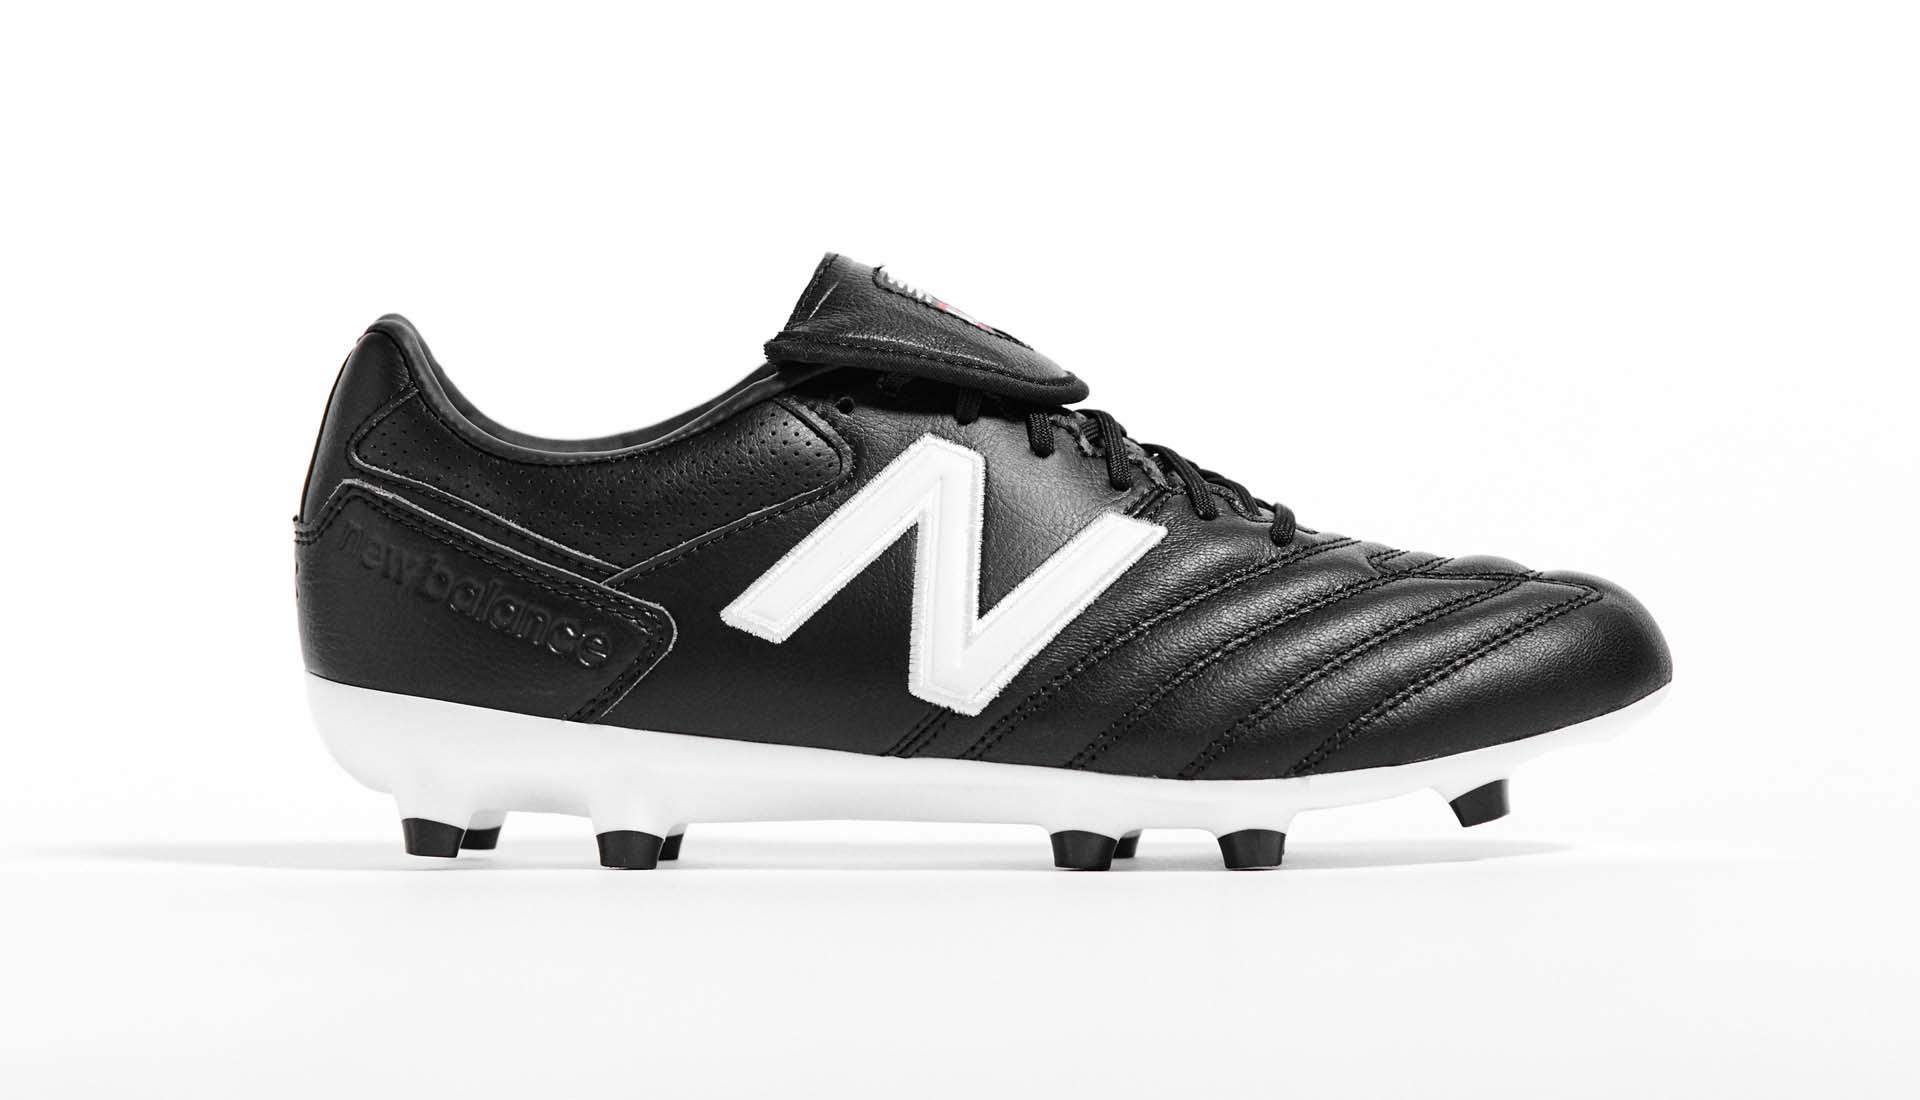 New Balance Launch The '442' Football